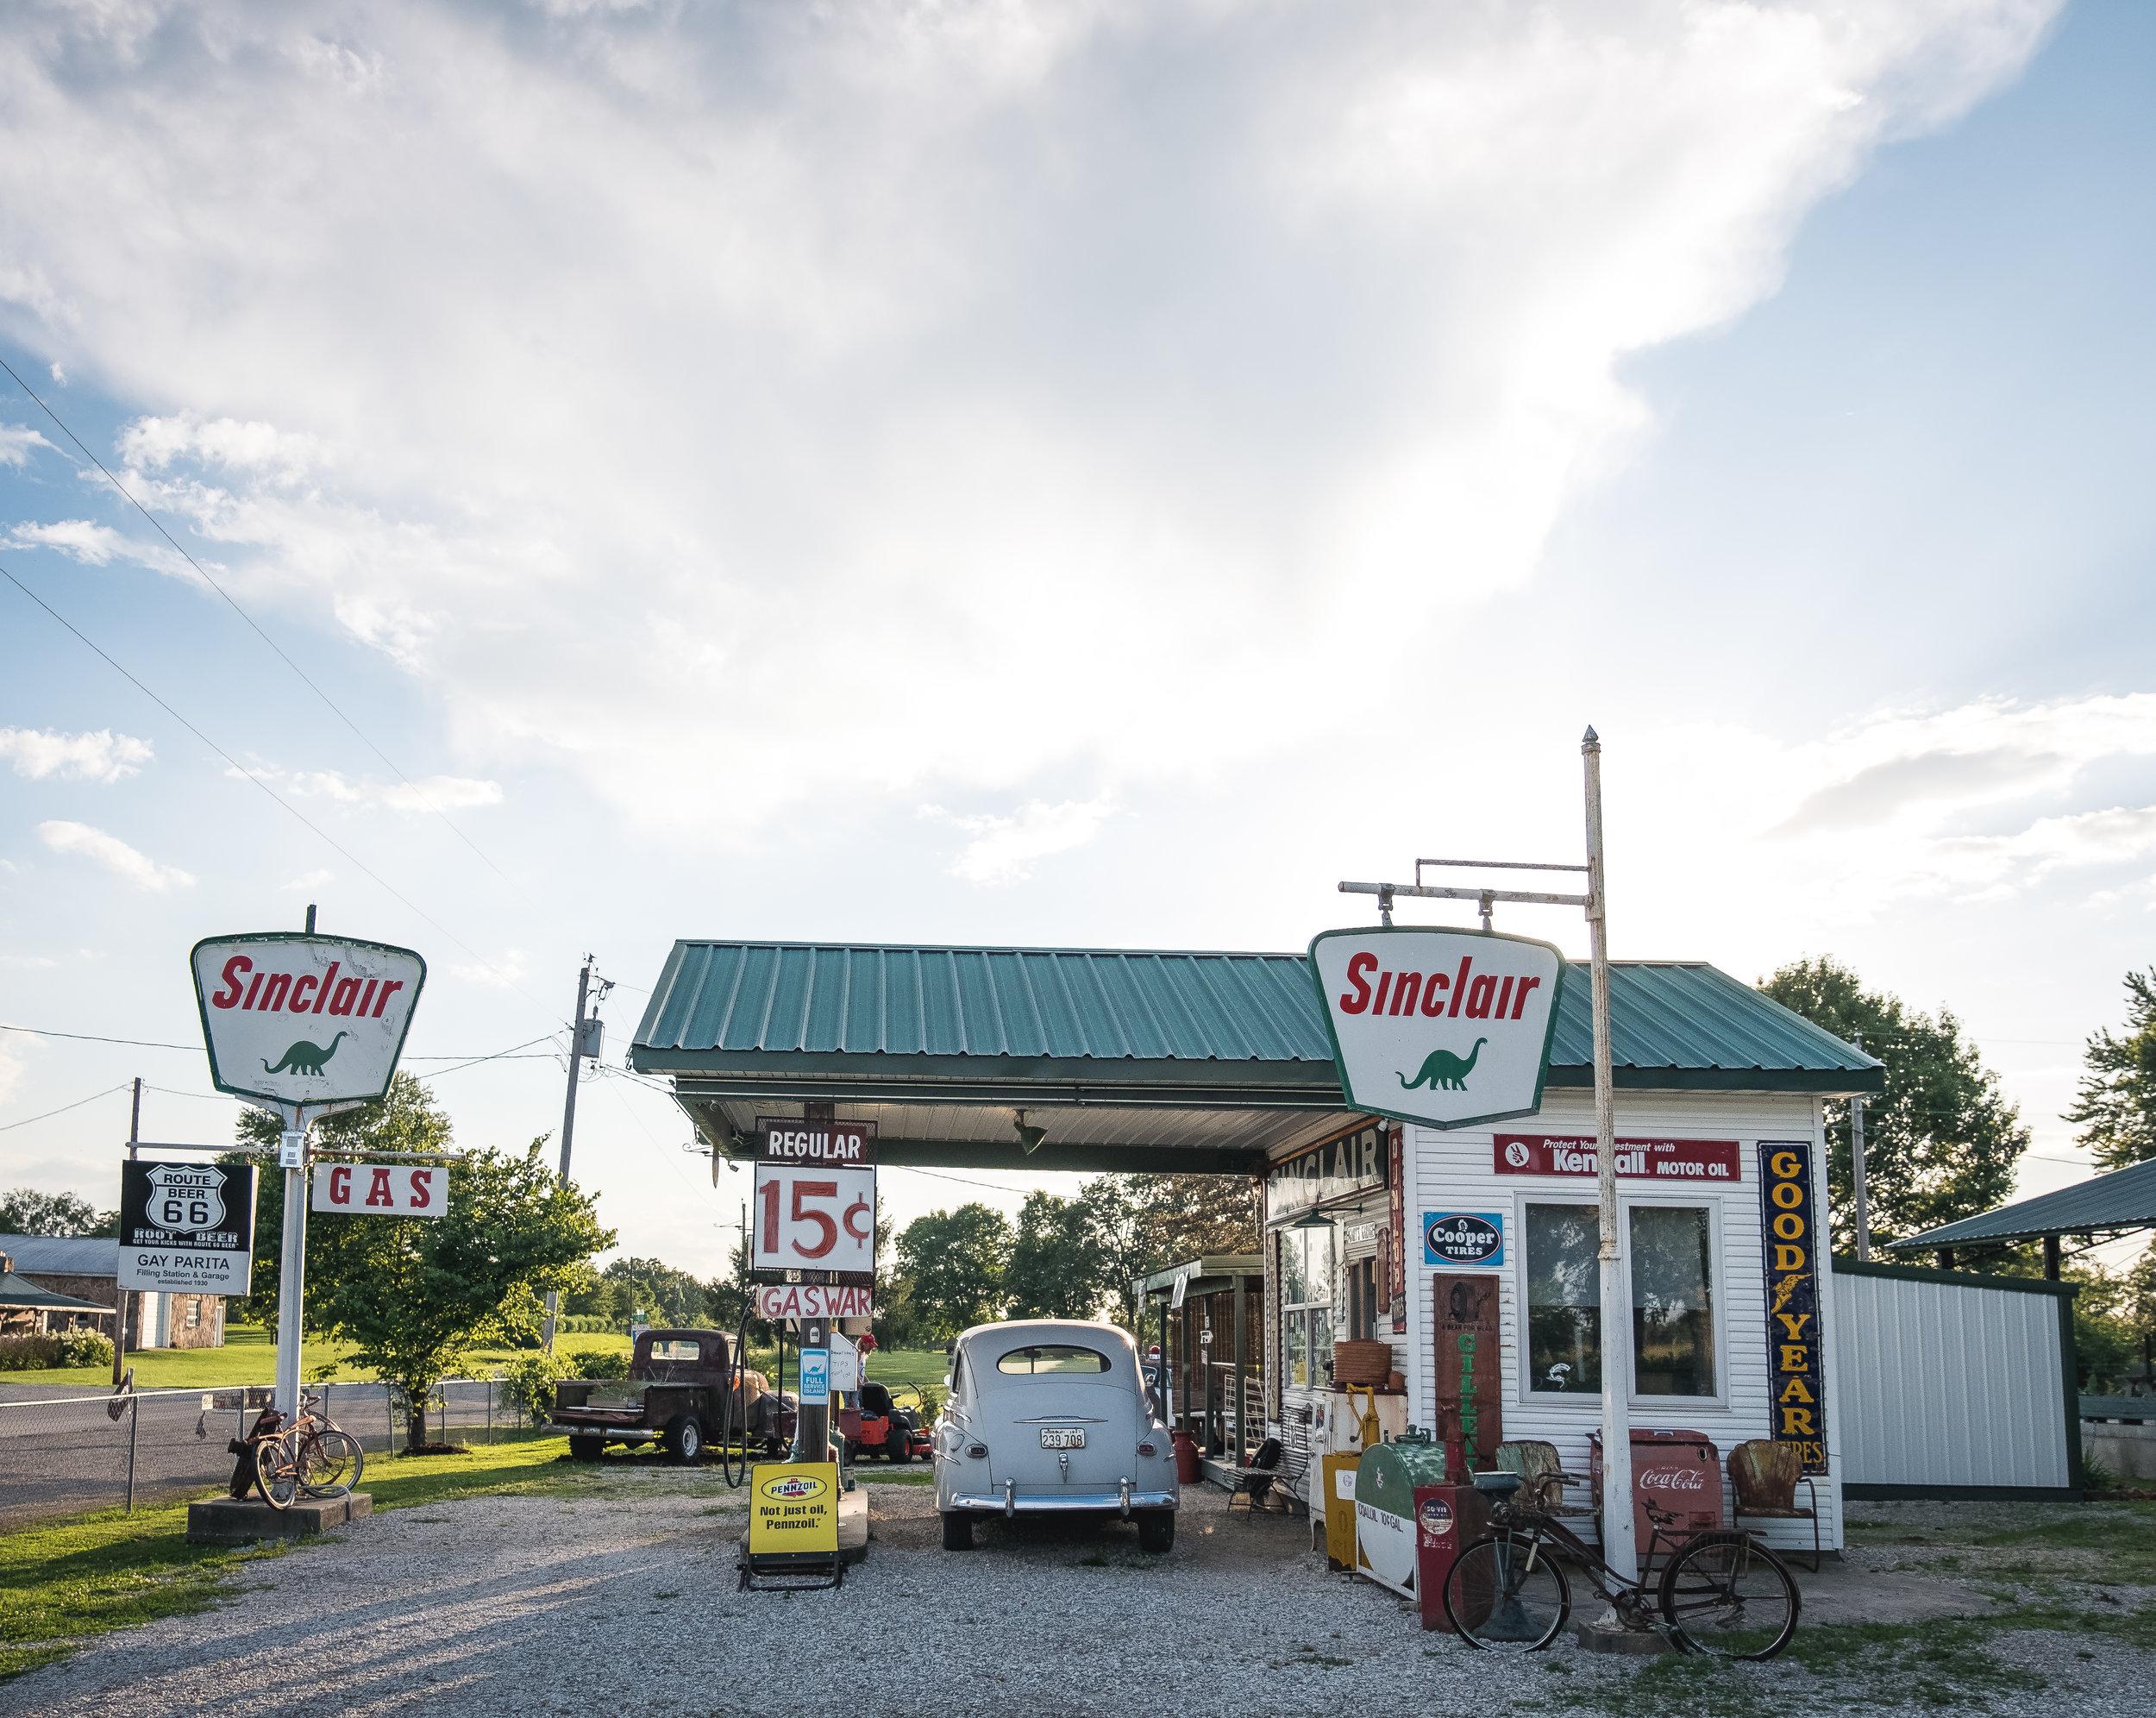 The Great American Roadtrip [Part 2]_79.jpg